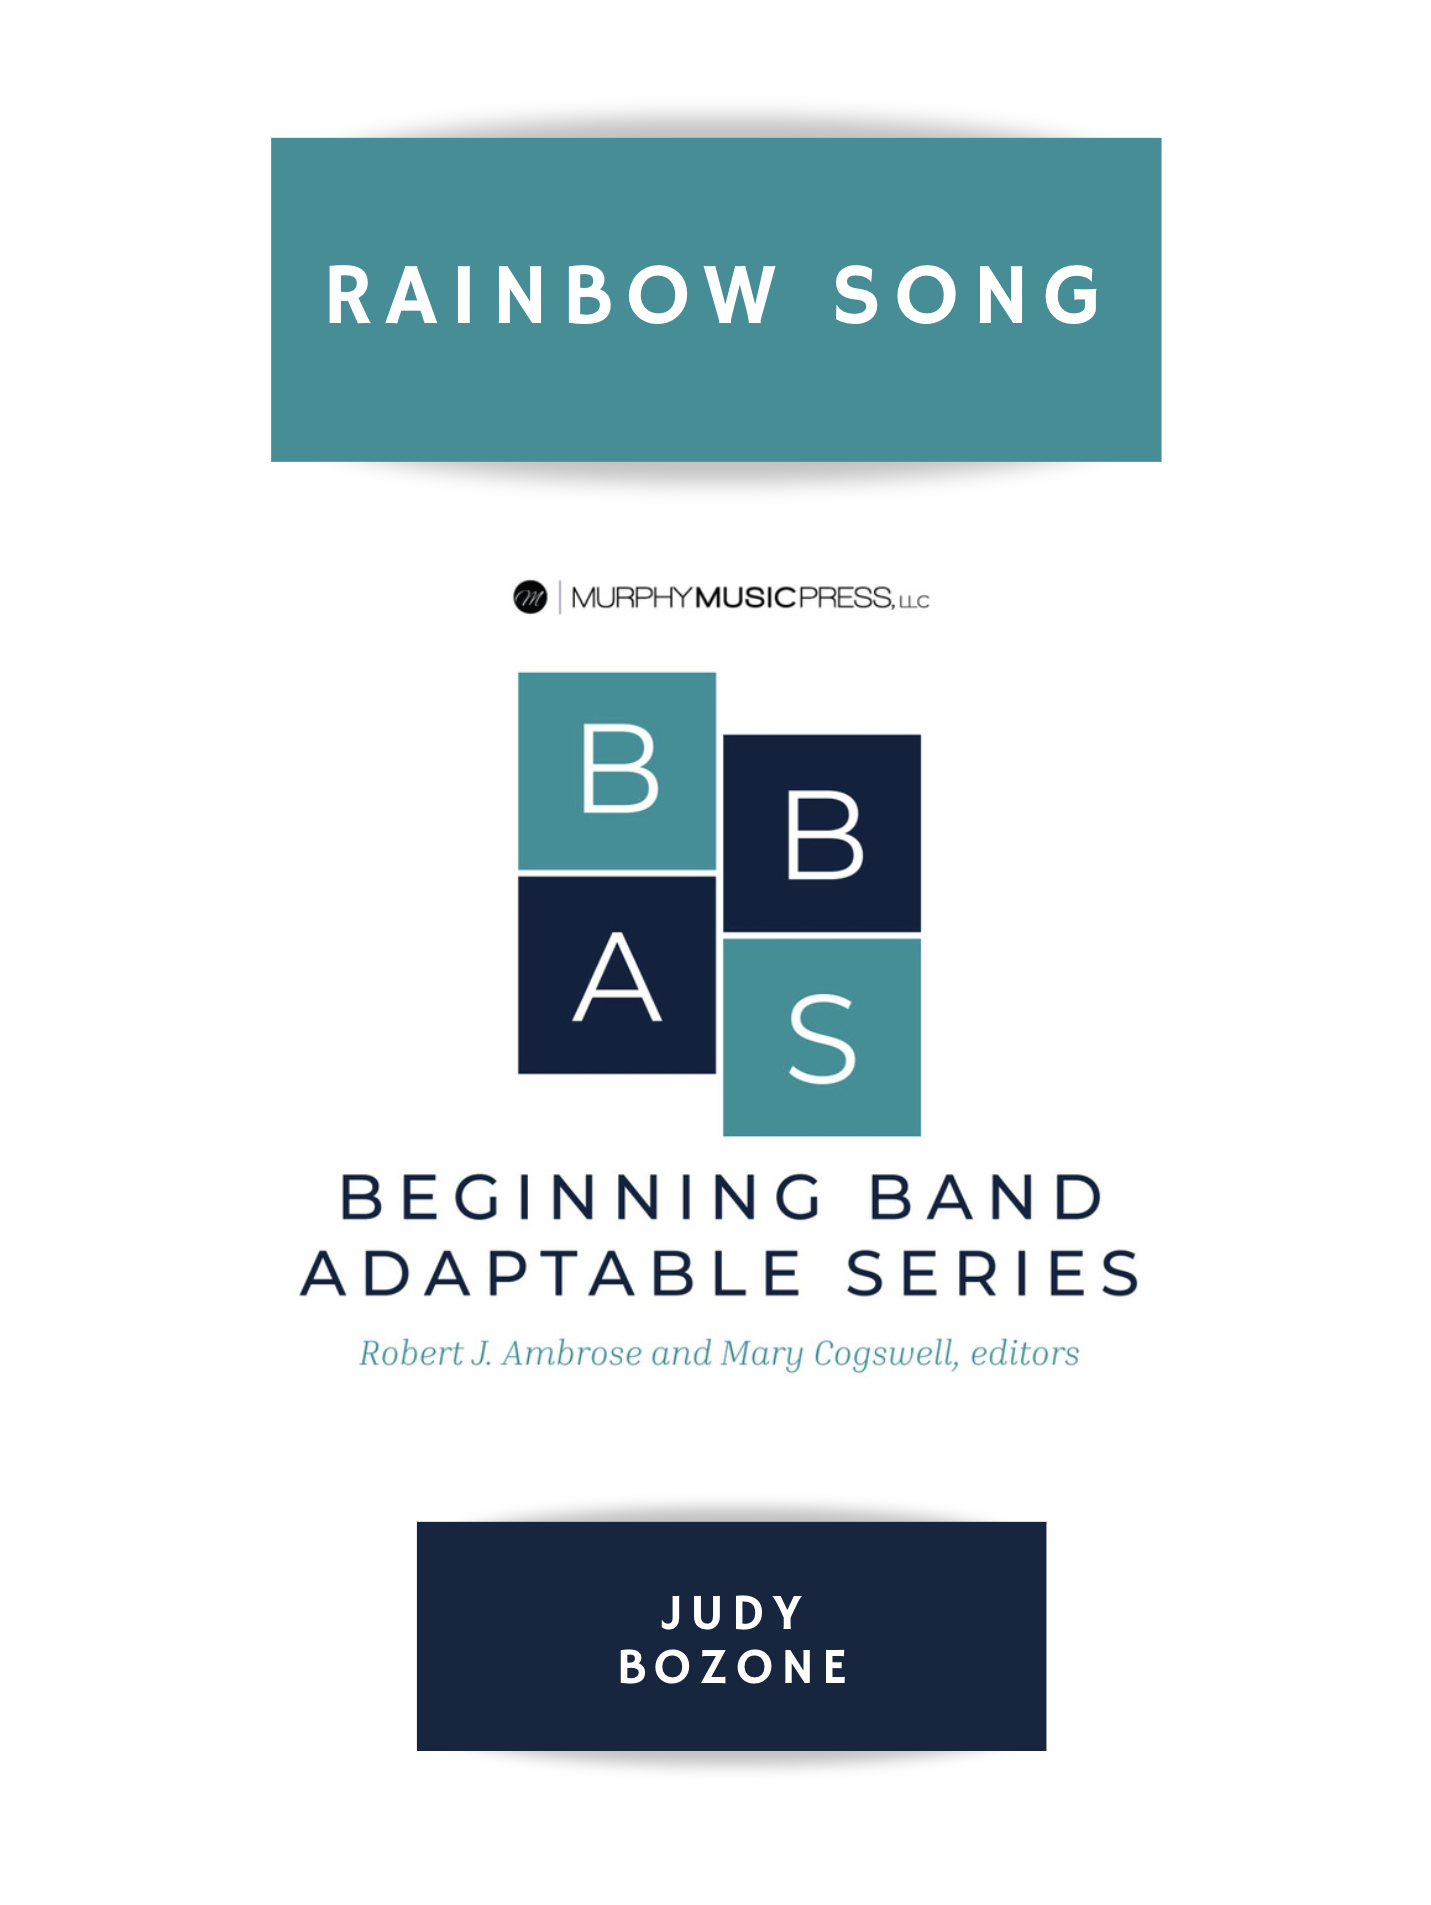 Rainbow Song by Judy Bozone